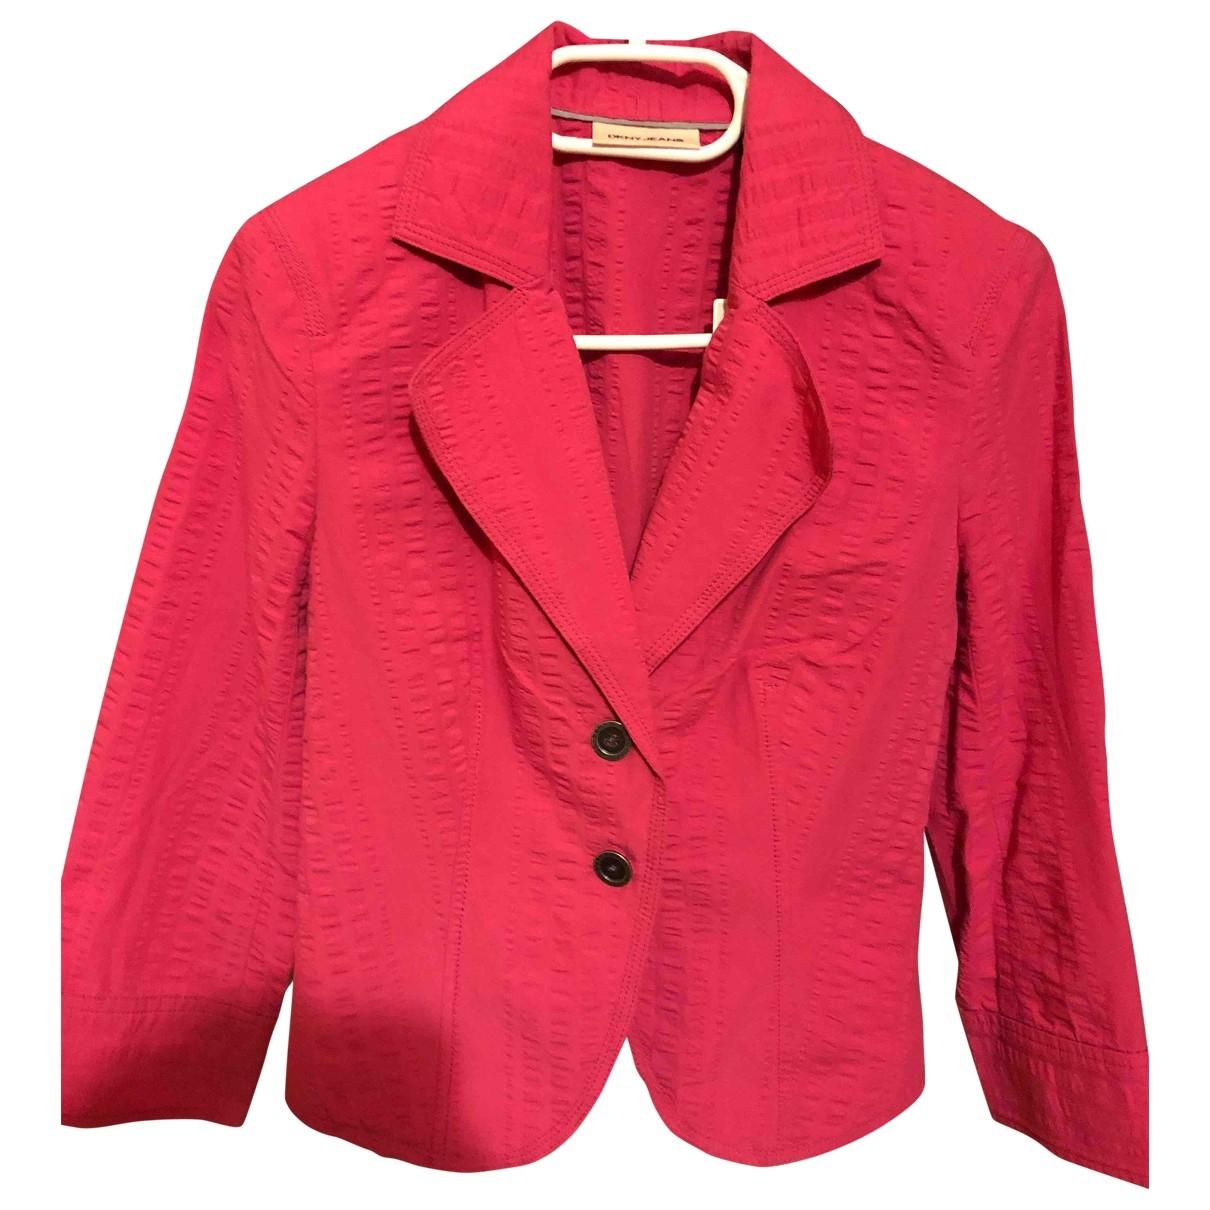 Dkny \N Pink Cotton jacket for Women XS International